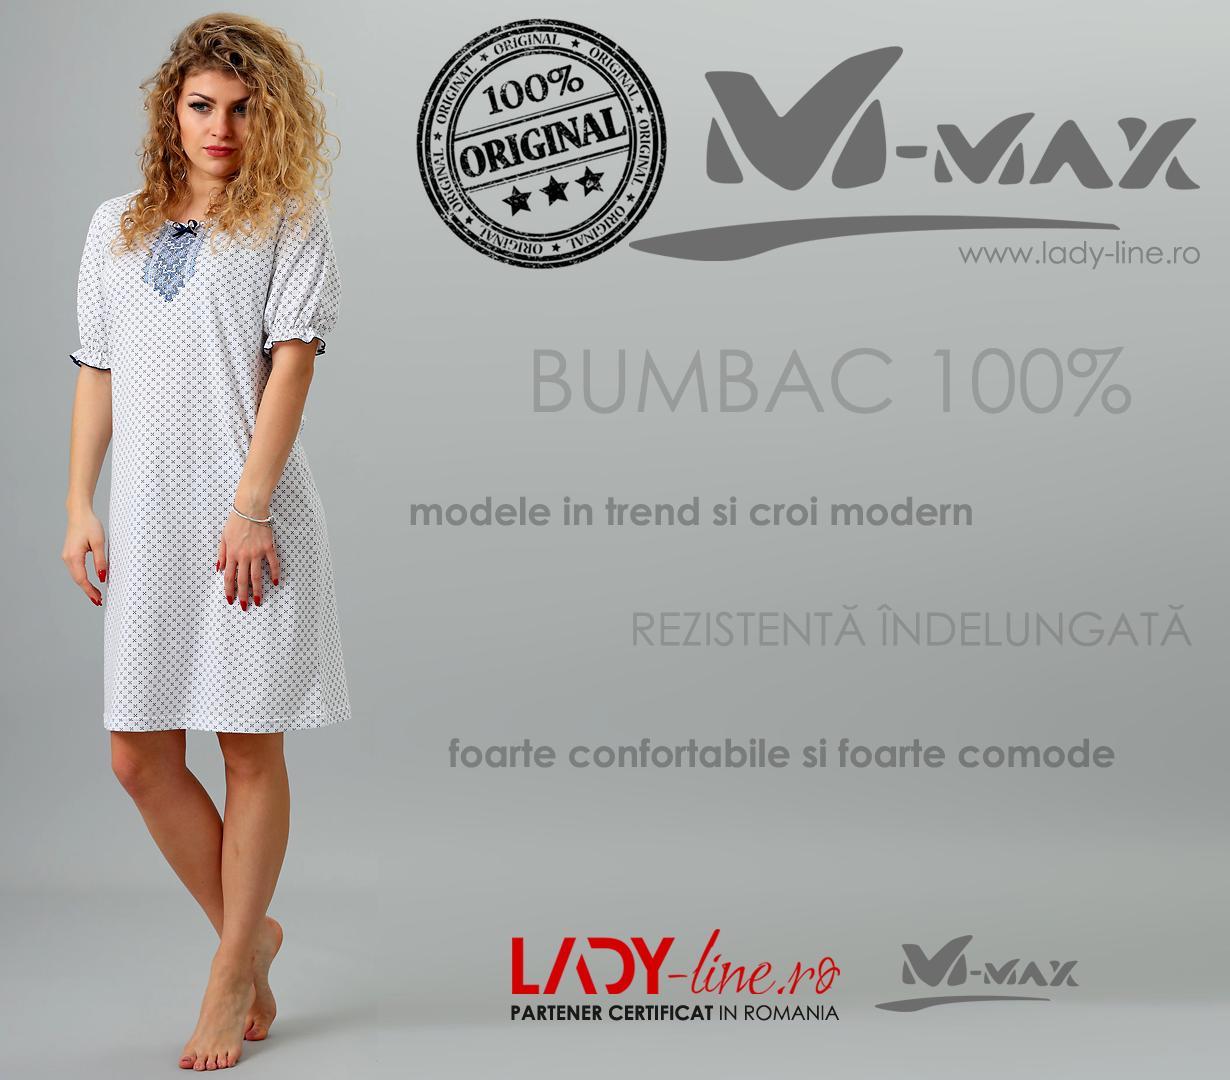 Camasa de Noapte M-Max, Bumbac 100%, 'Popular Tradition'